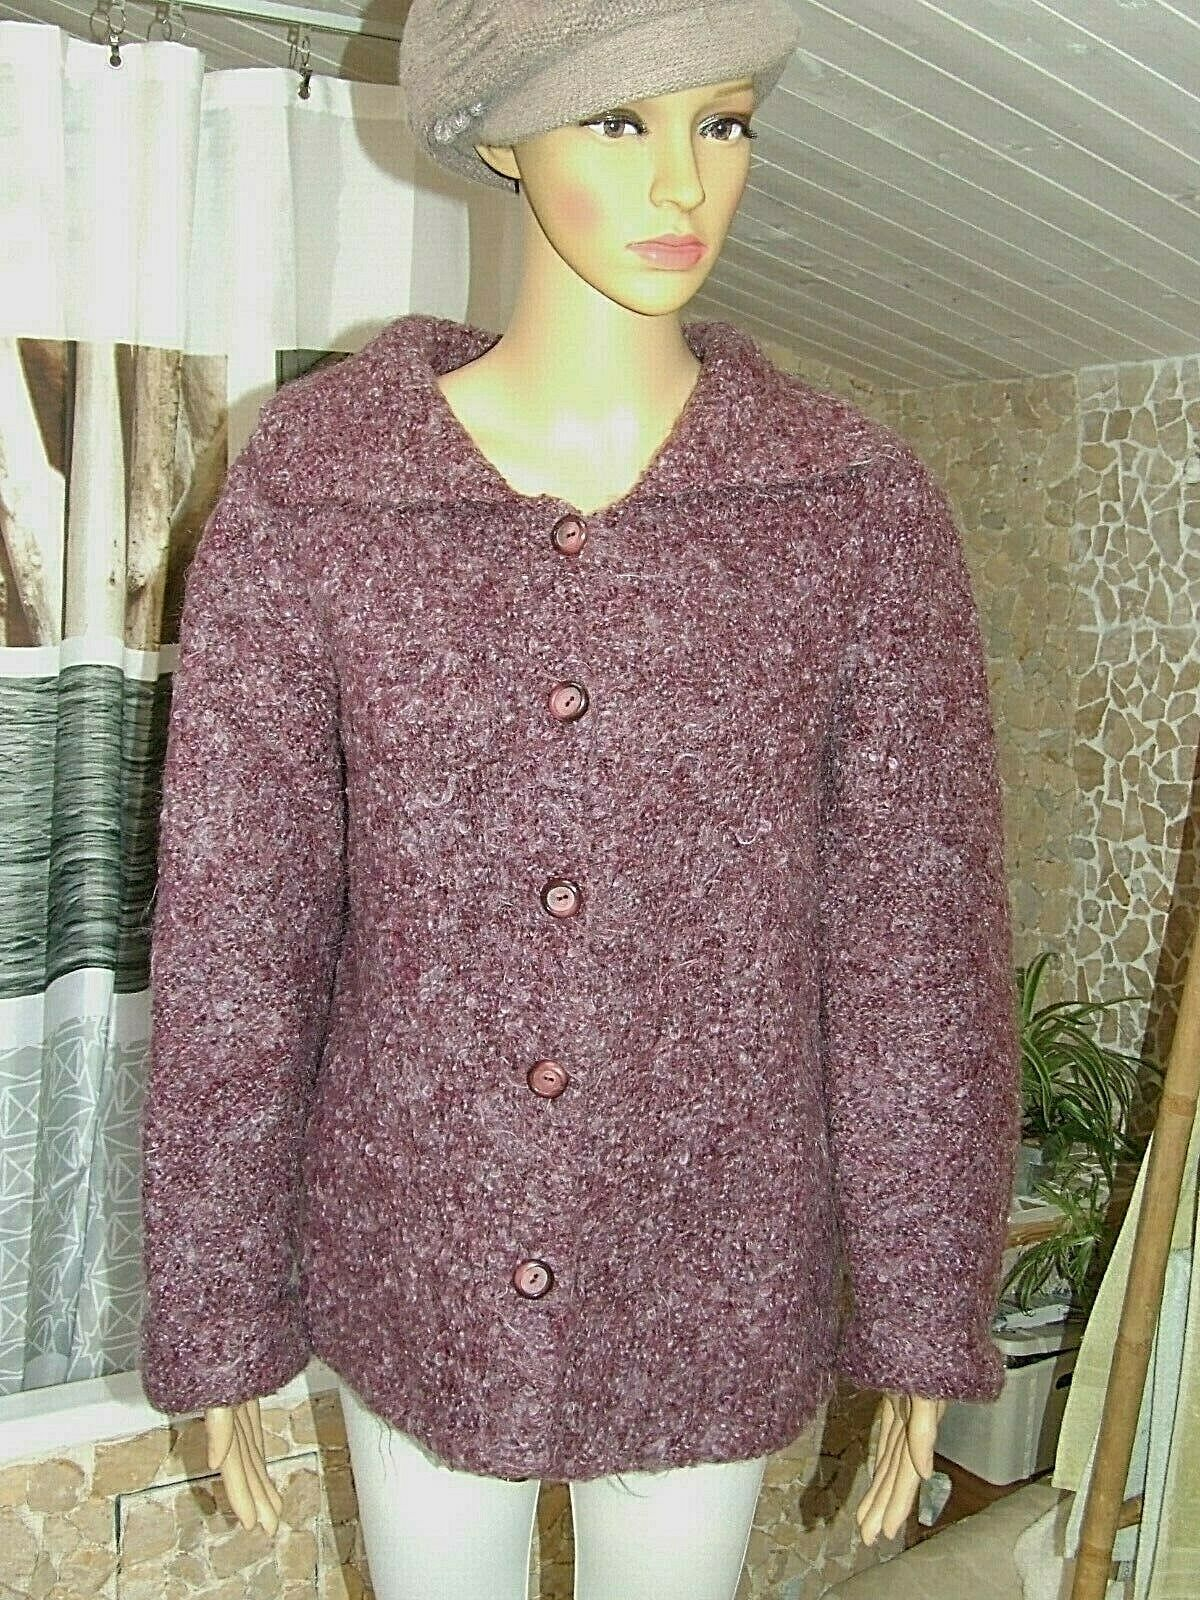 Superbe pull / veste / gilet tricoté main mohair  laine phildar  taille 42 / 44